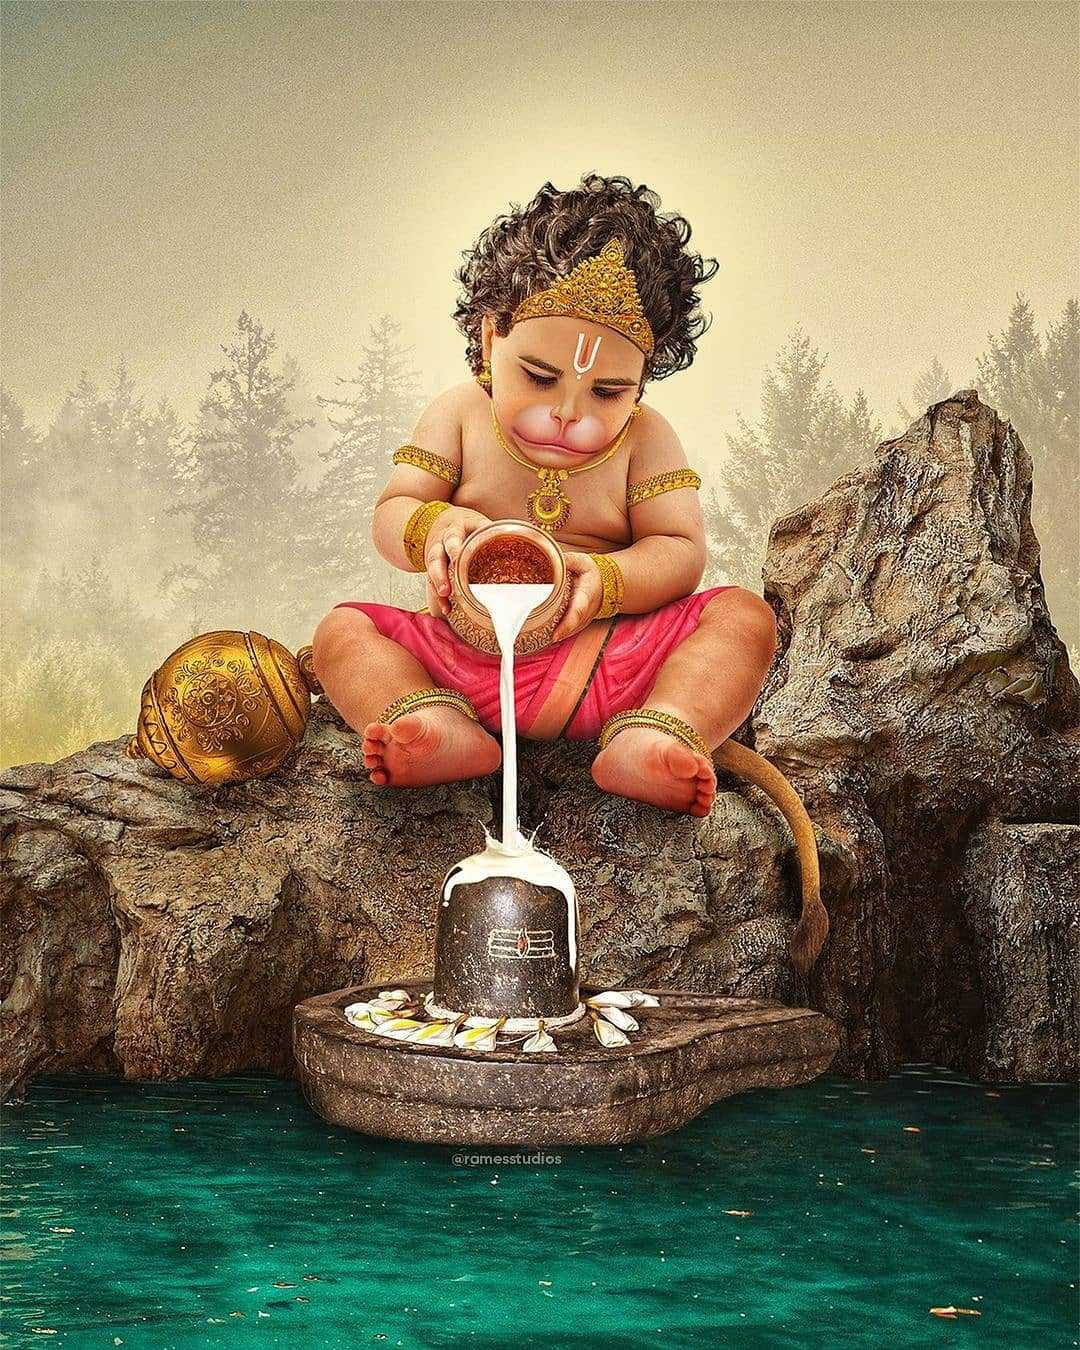 God Hanuman Bhagwan New Picture Free Download Kare - God Hanuman Bhagwan New Picture Free Download Kare